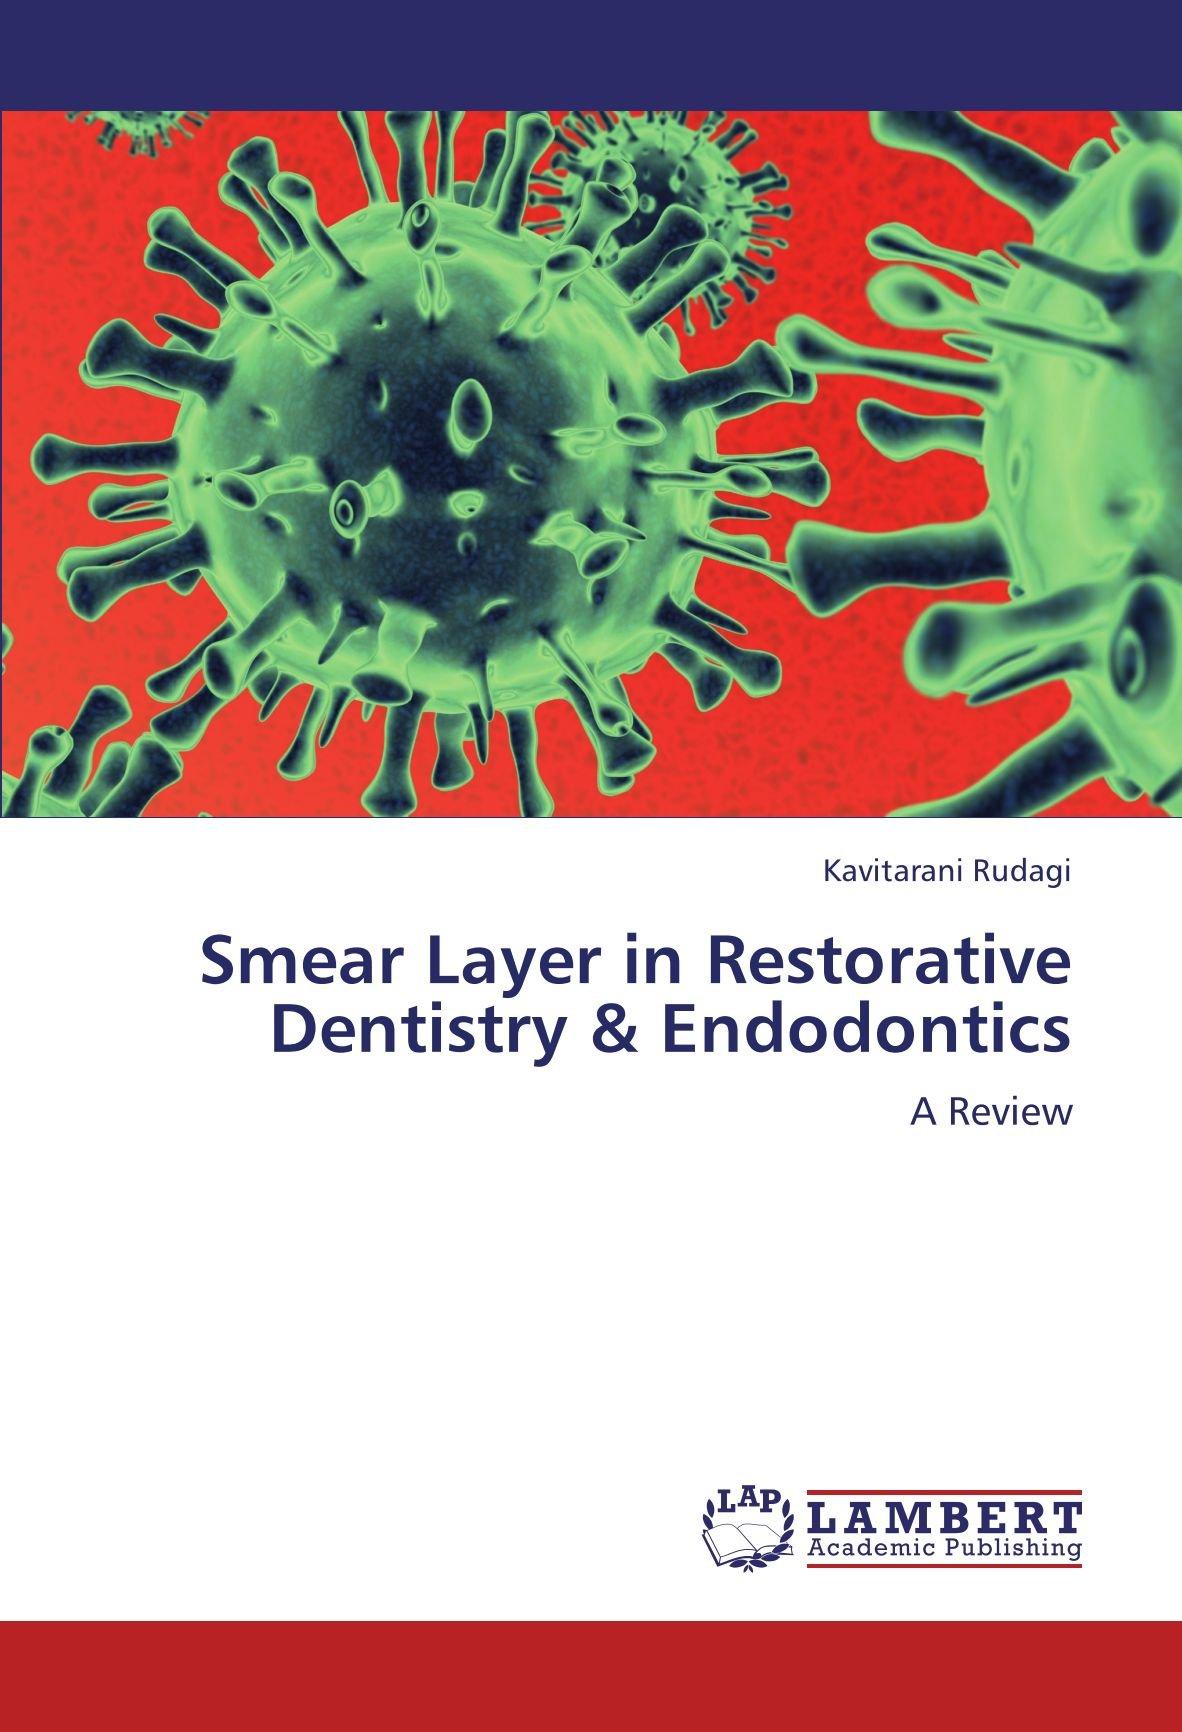 Smear Layer in Restorative Dentistry & Endodontics: A Review